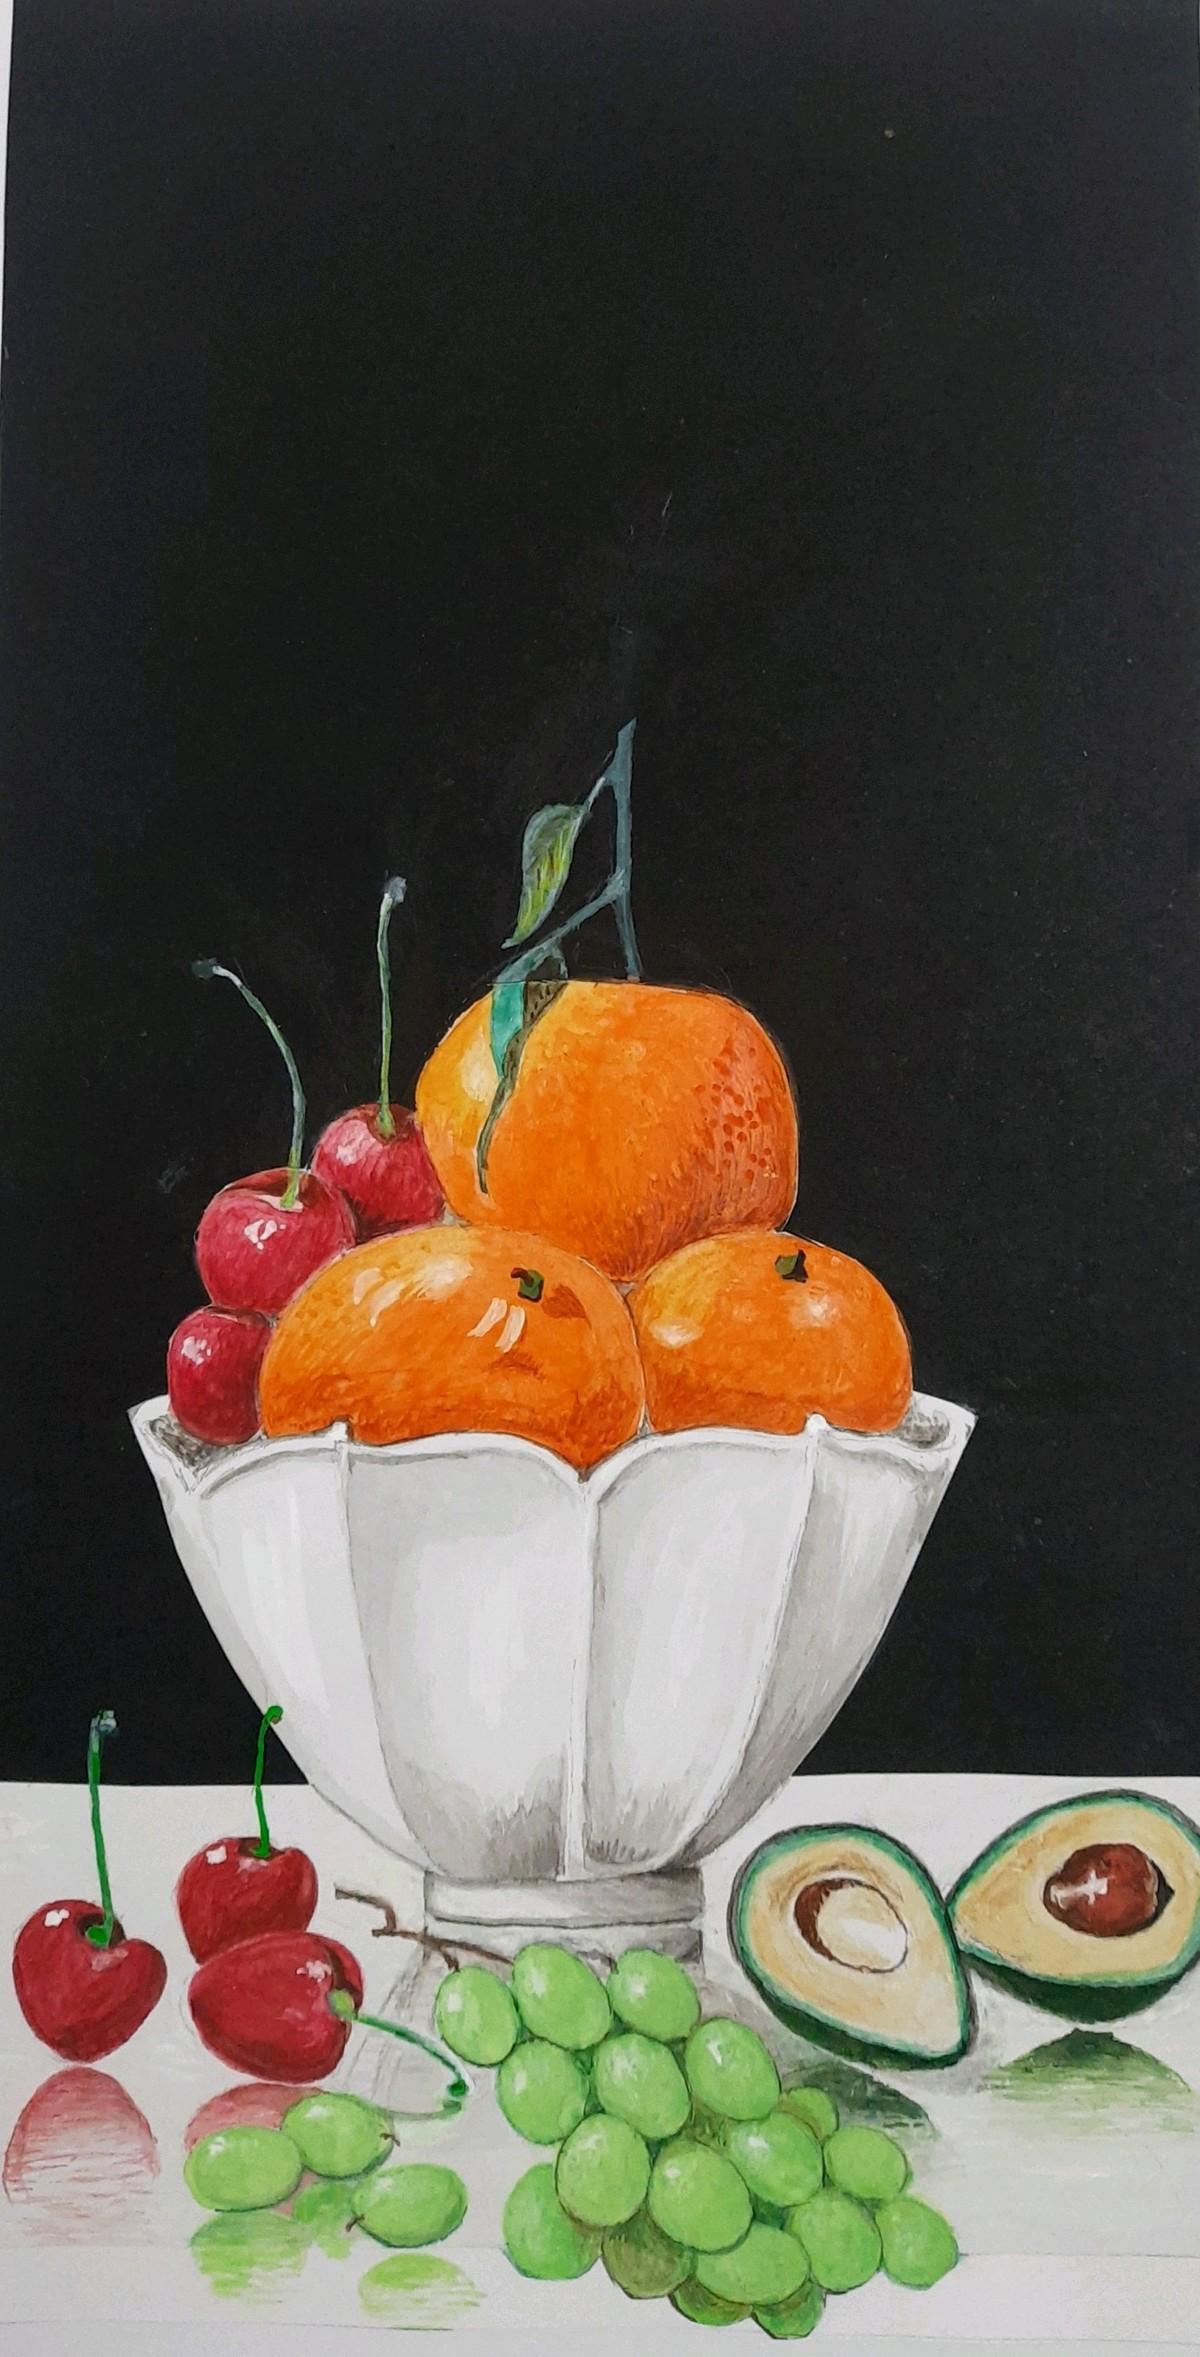 Fruit basket Digital Print by Surendra Kumar Srivastava,Expressionism